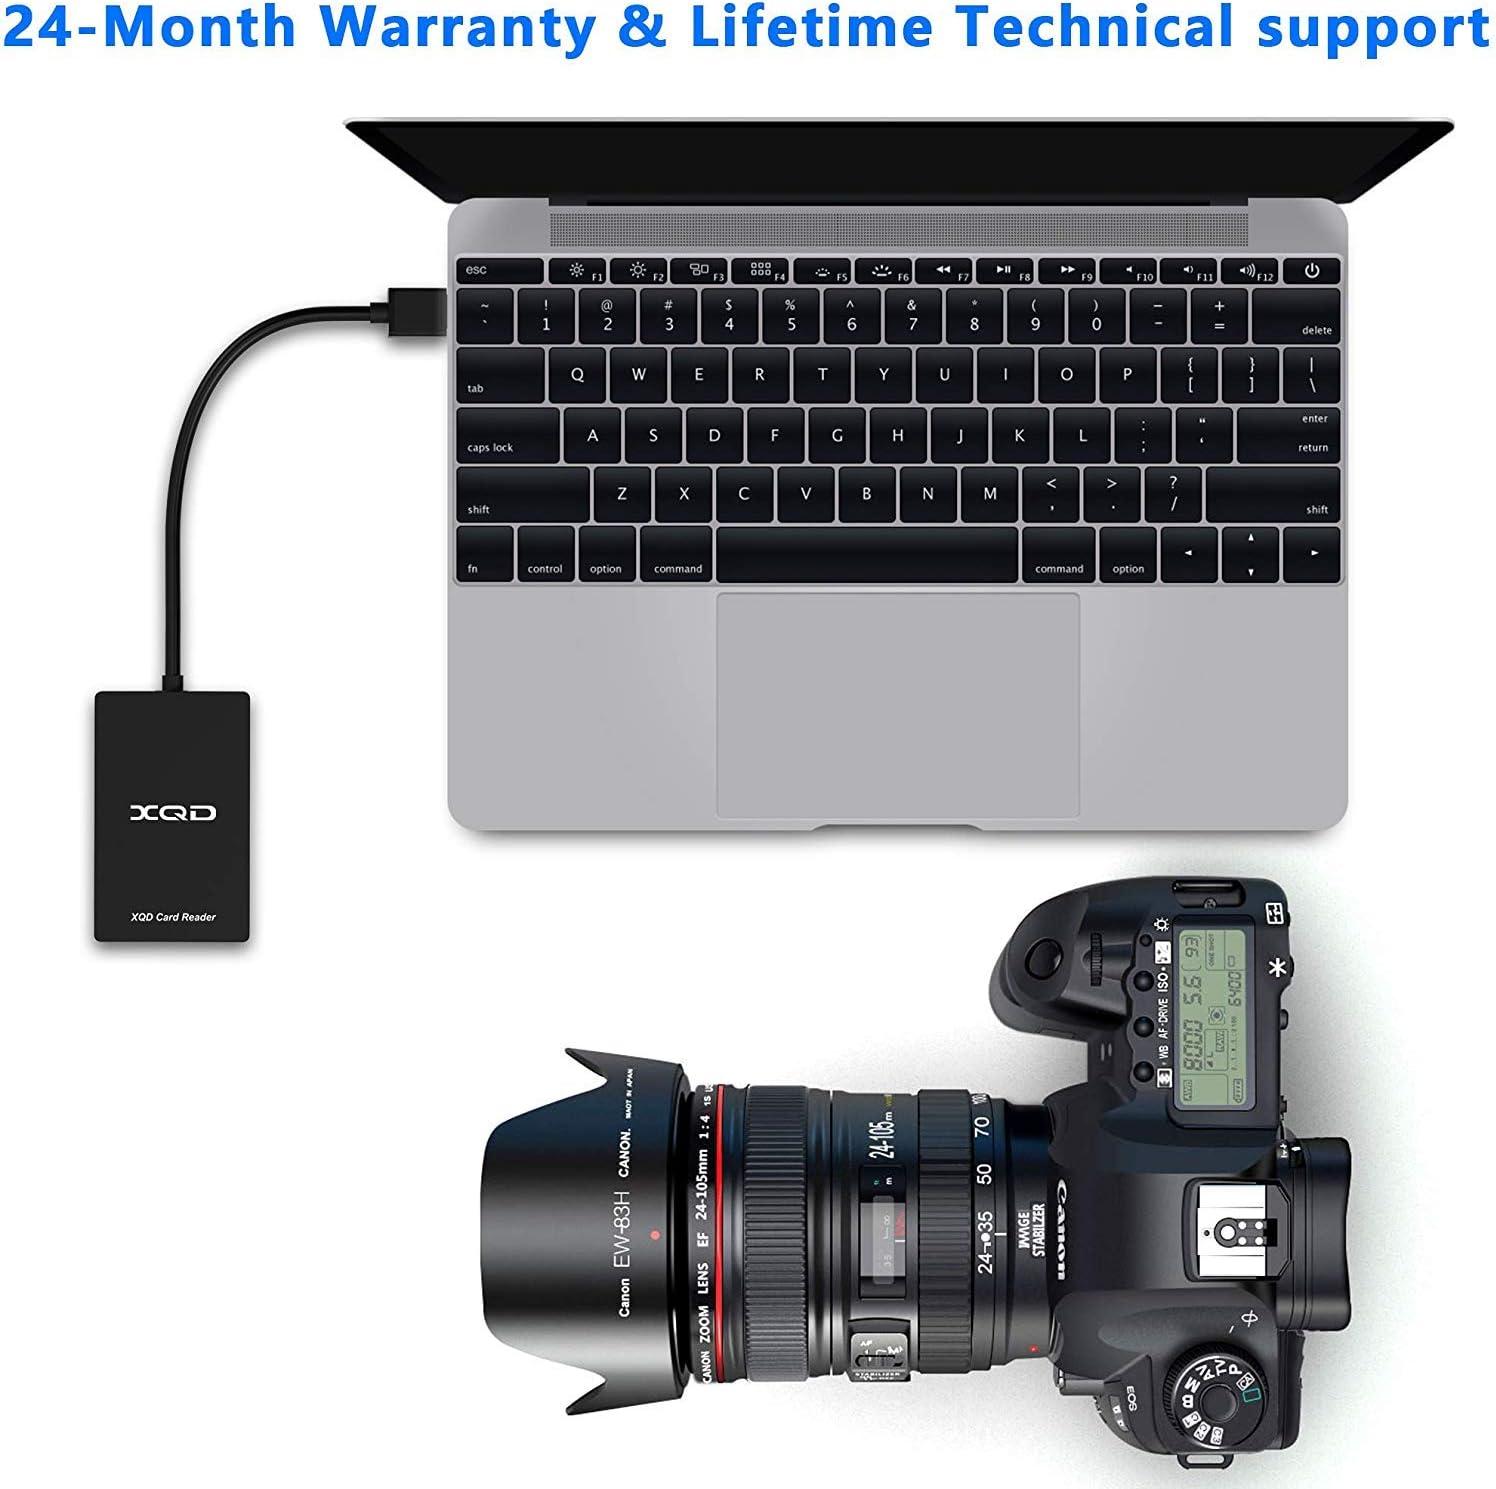 Read 440MB//s and Write 400MB//s New Sony 32GB XQD Flash Memory Card High Speed G-2020 Series - QDG32E-2